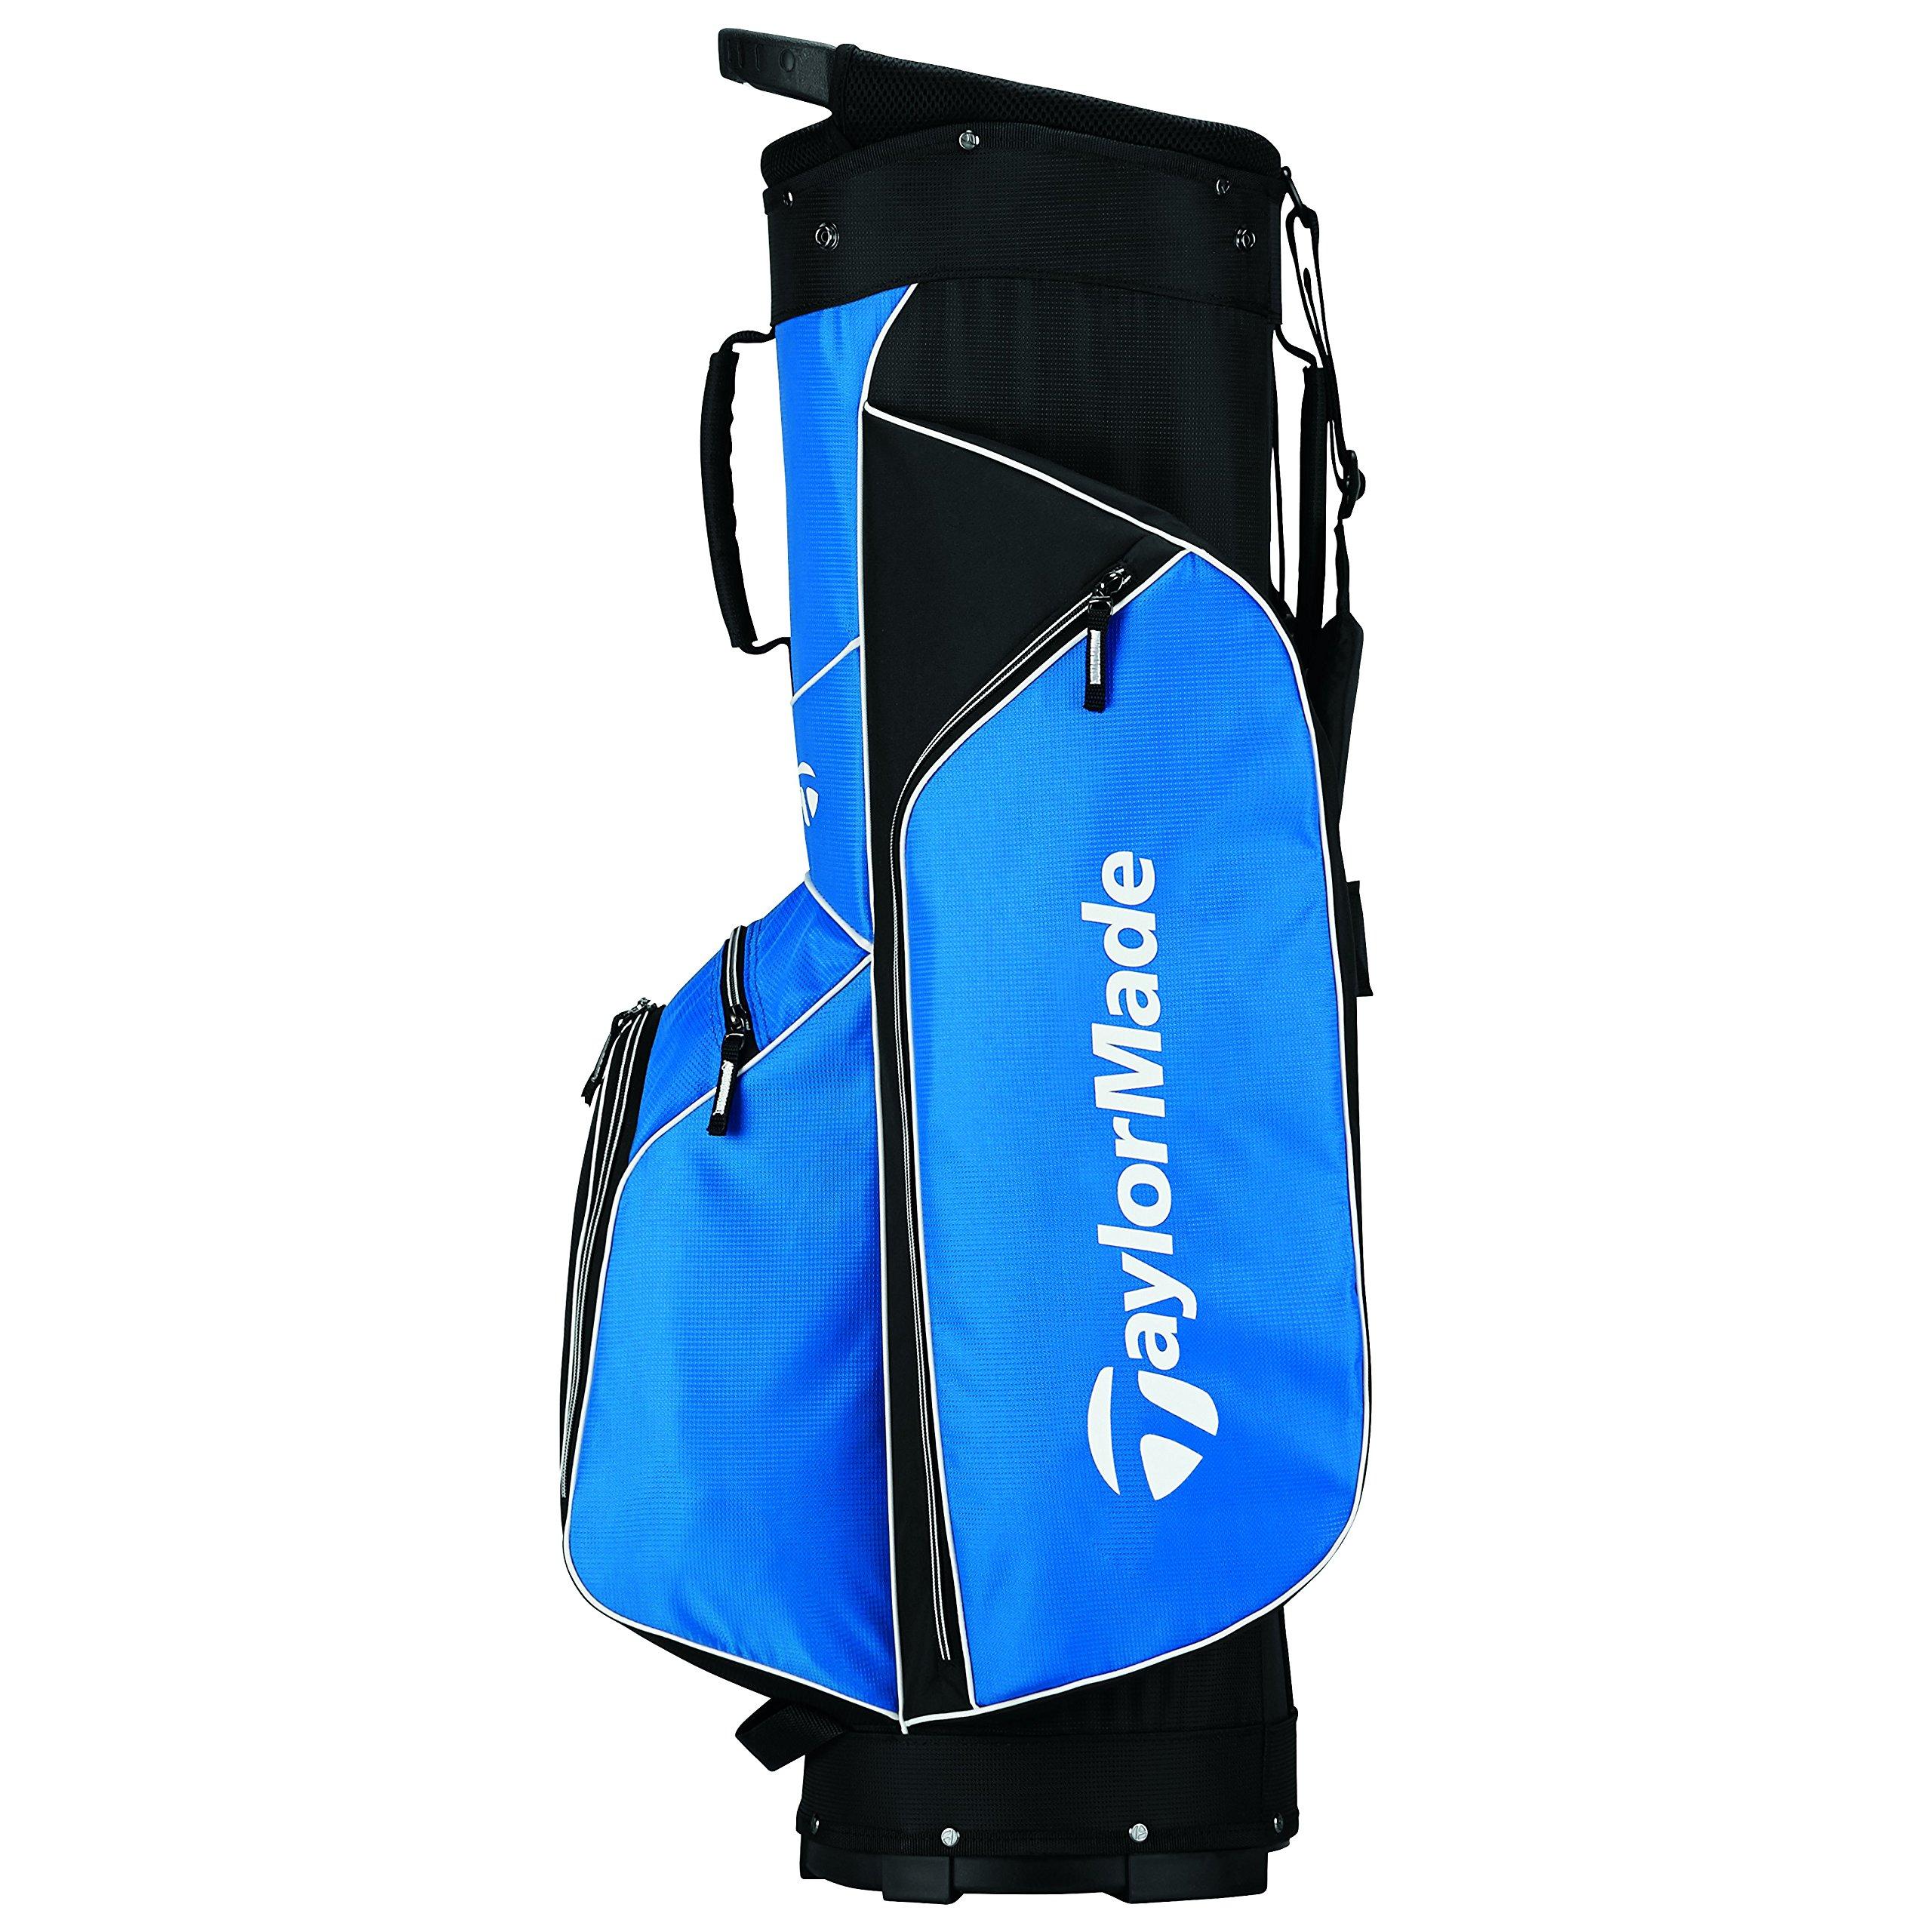 TaylorMade 2017 Golf Bag TM Cart Bag 5.0 BluBlk, Blue/Black